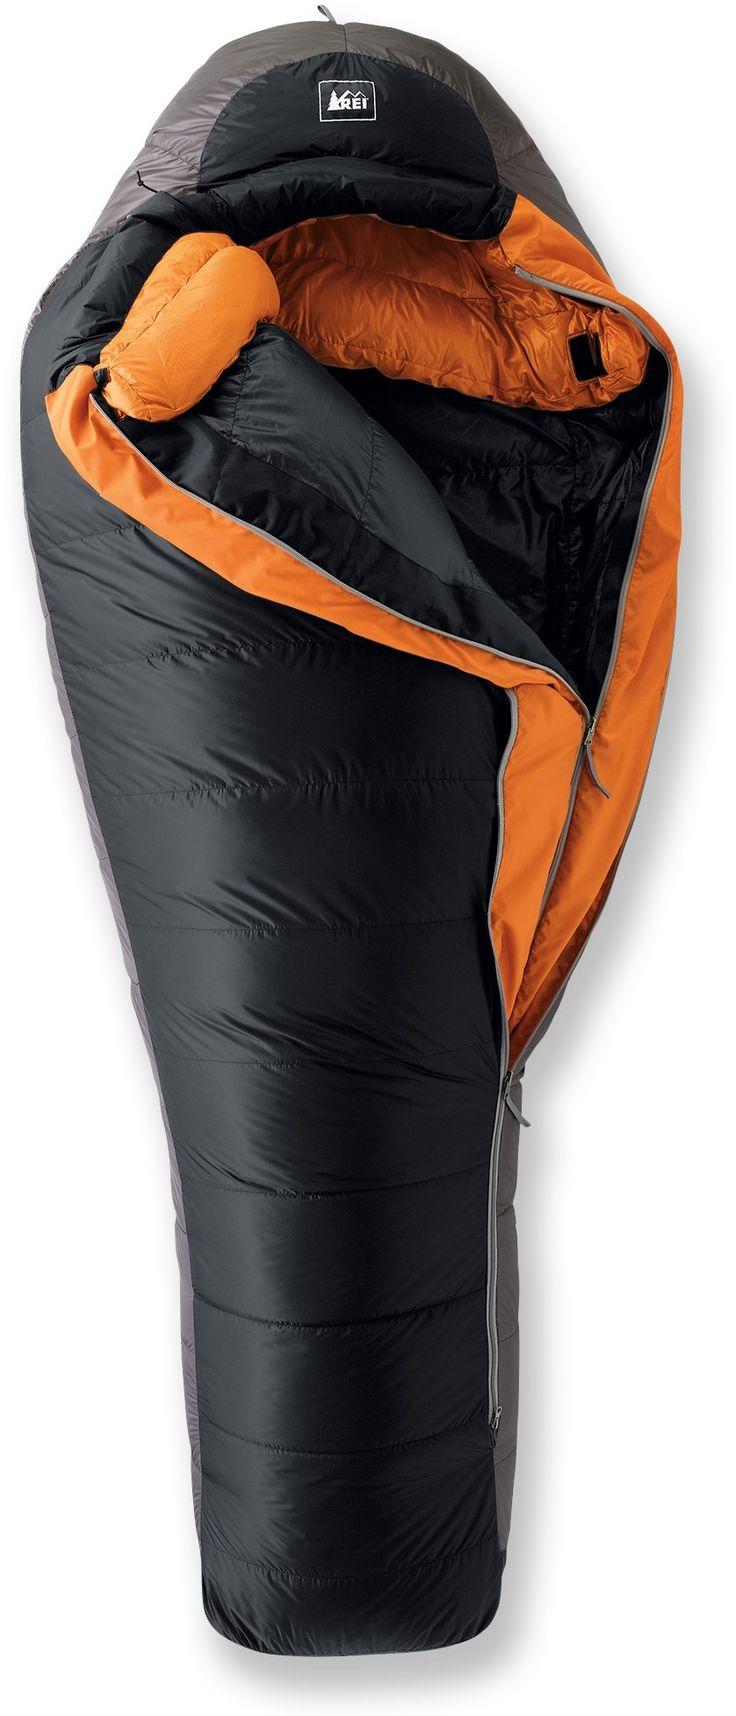 REI Expedition Sleeping Bag